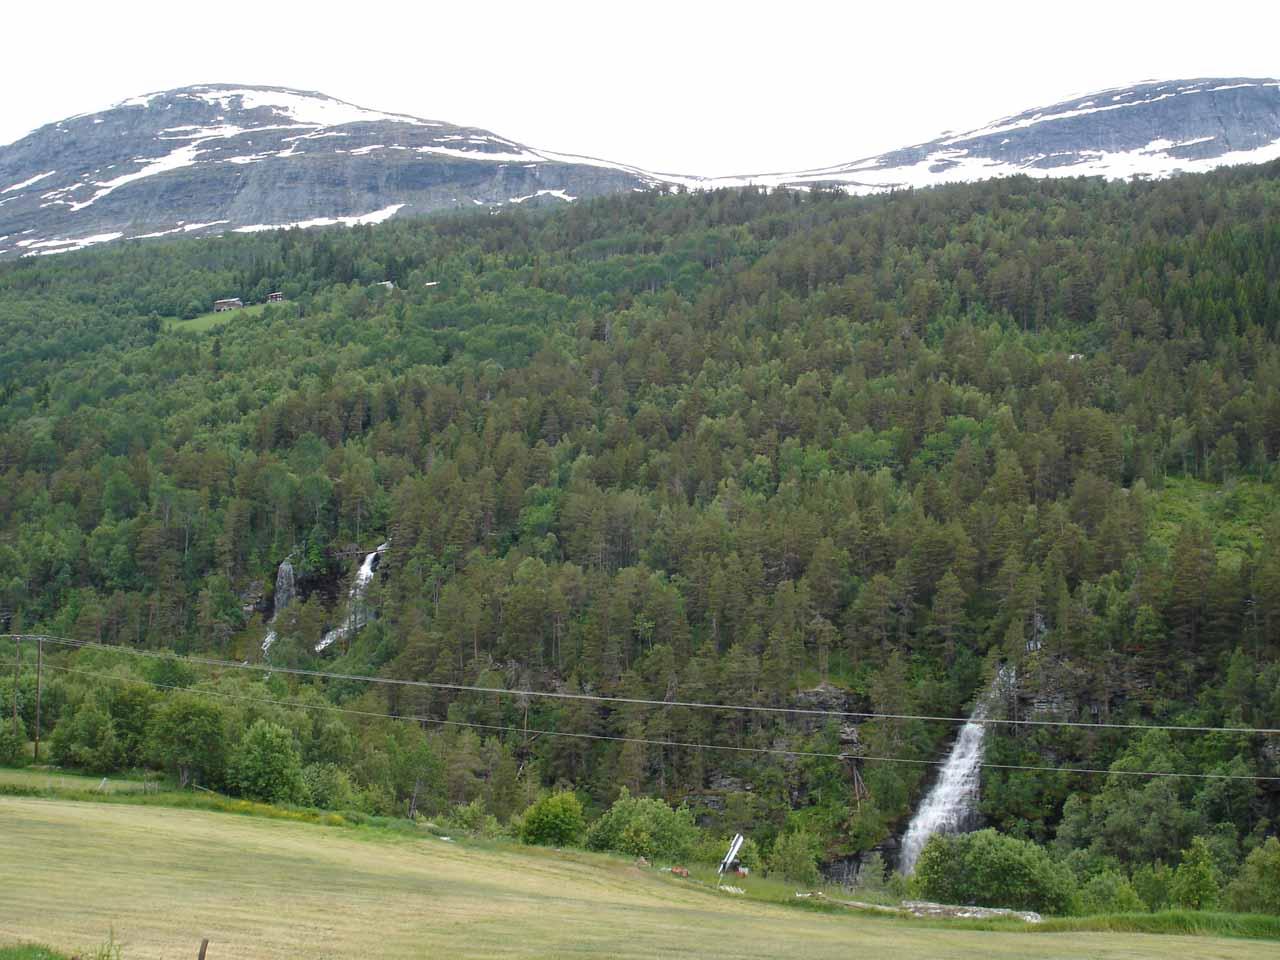 Broad view of some other waterfalls between Slettafossen and Vermafossen